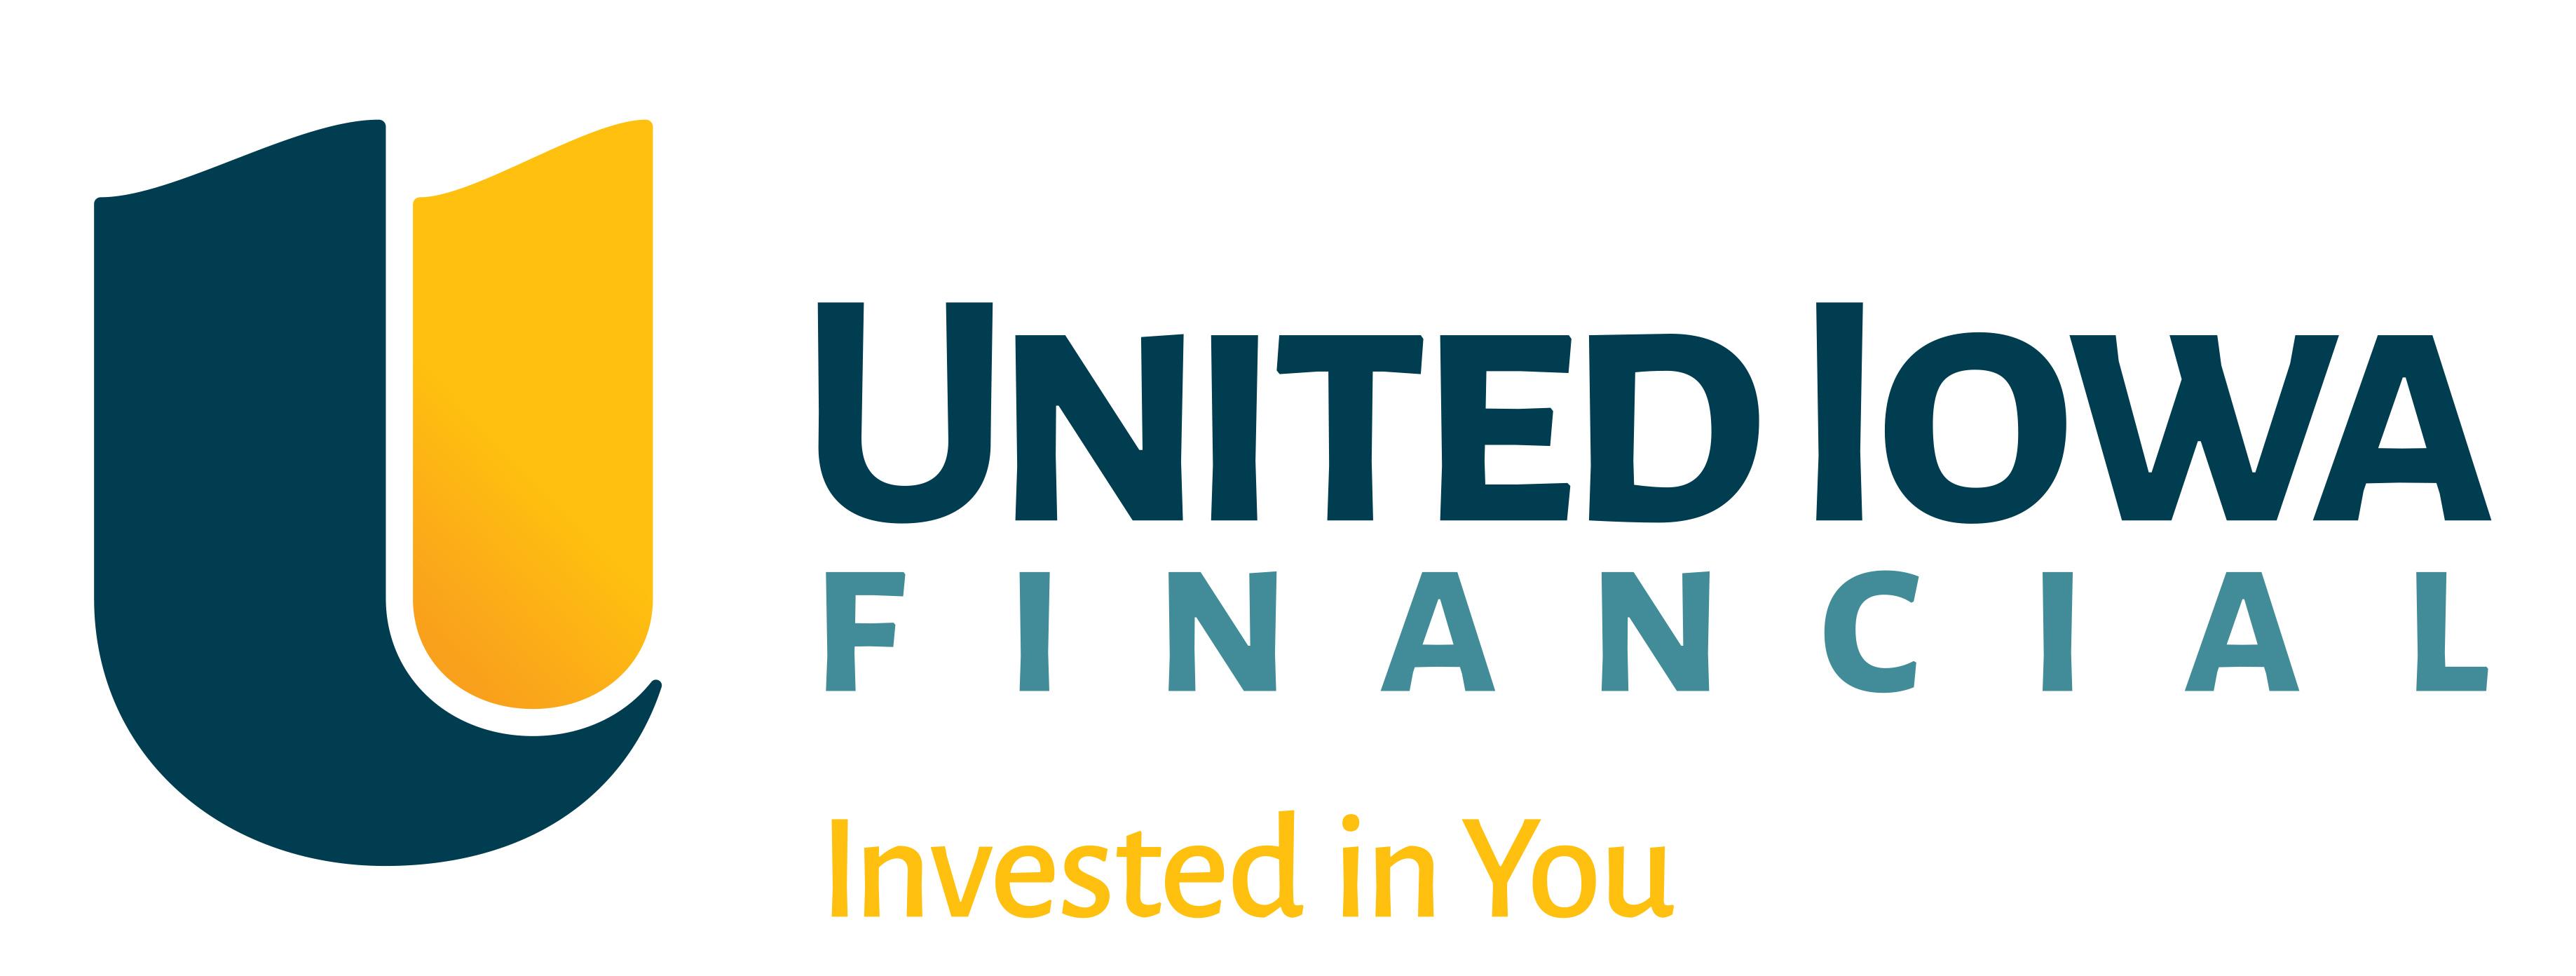 UI_Financial_-_Logo_-_Color_-_Tag_-_Horiz